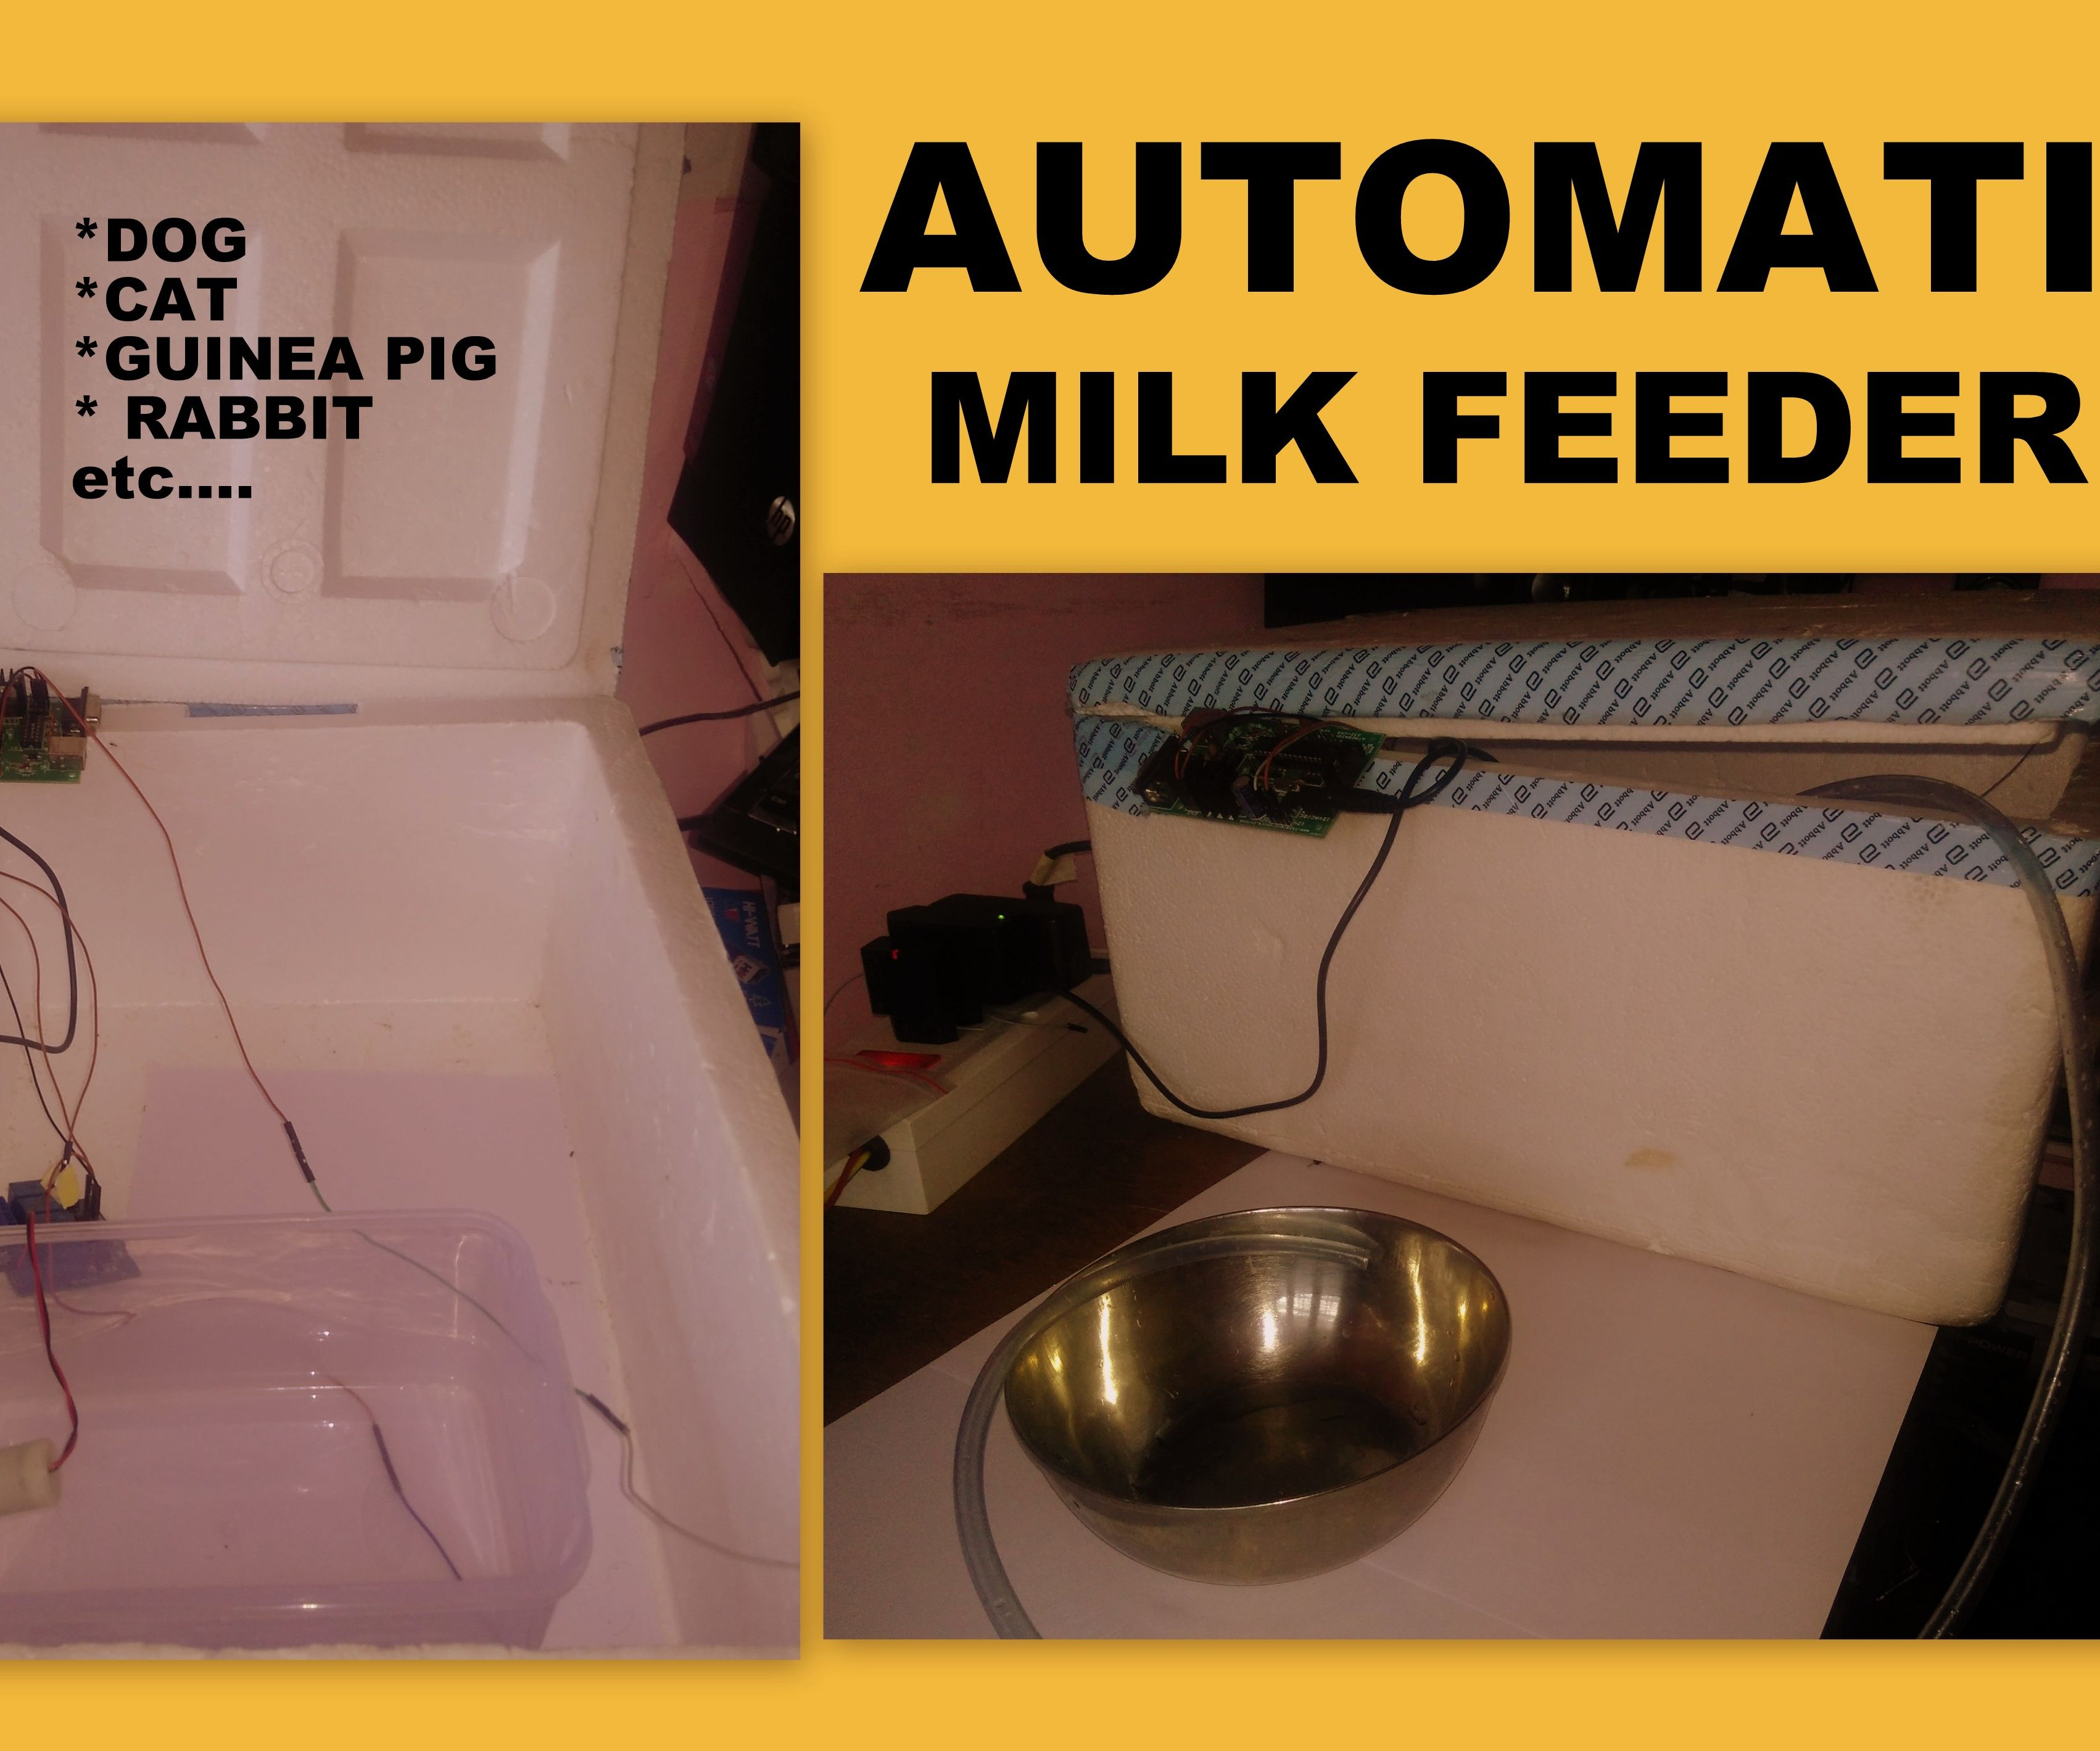 Arduino Automatic Milk feeder